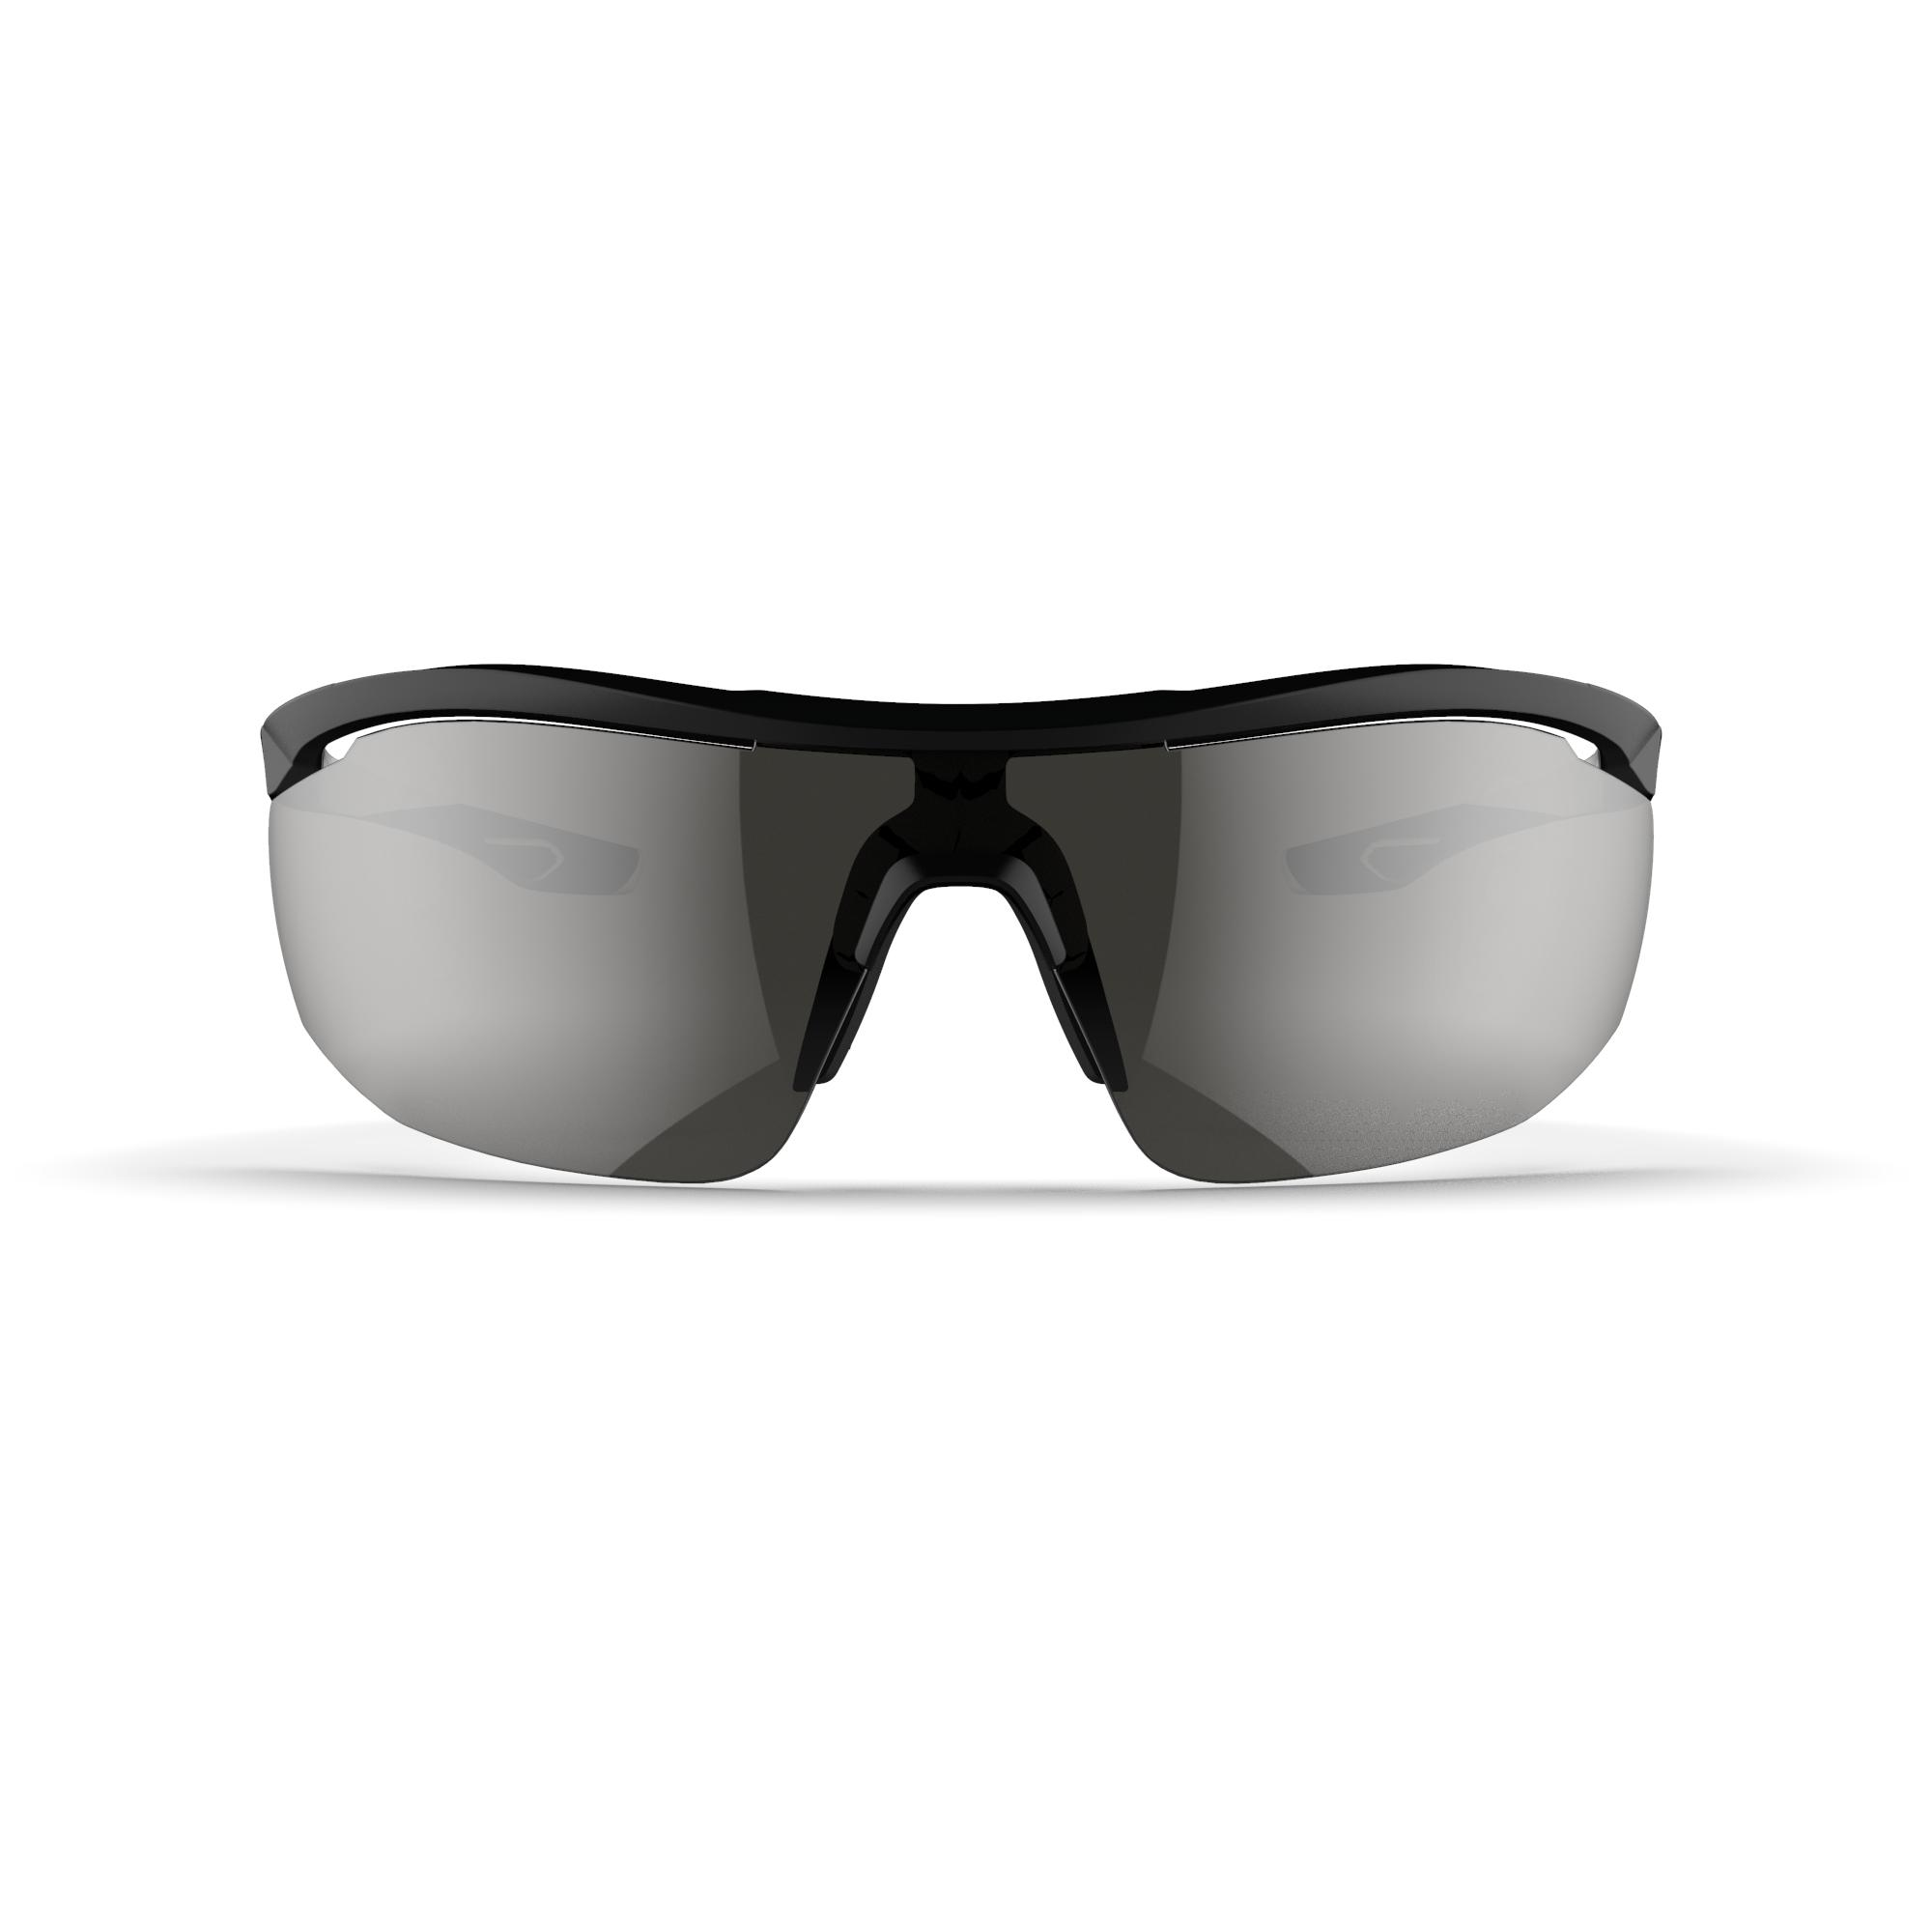 Runperf Category 3 Adult Running Glasses - Black/White - No Size By KALENJI | Decathlon